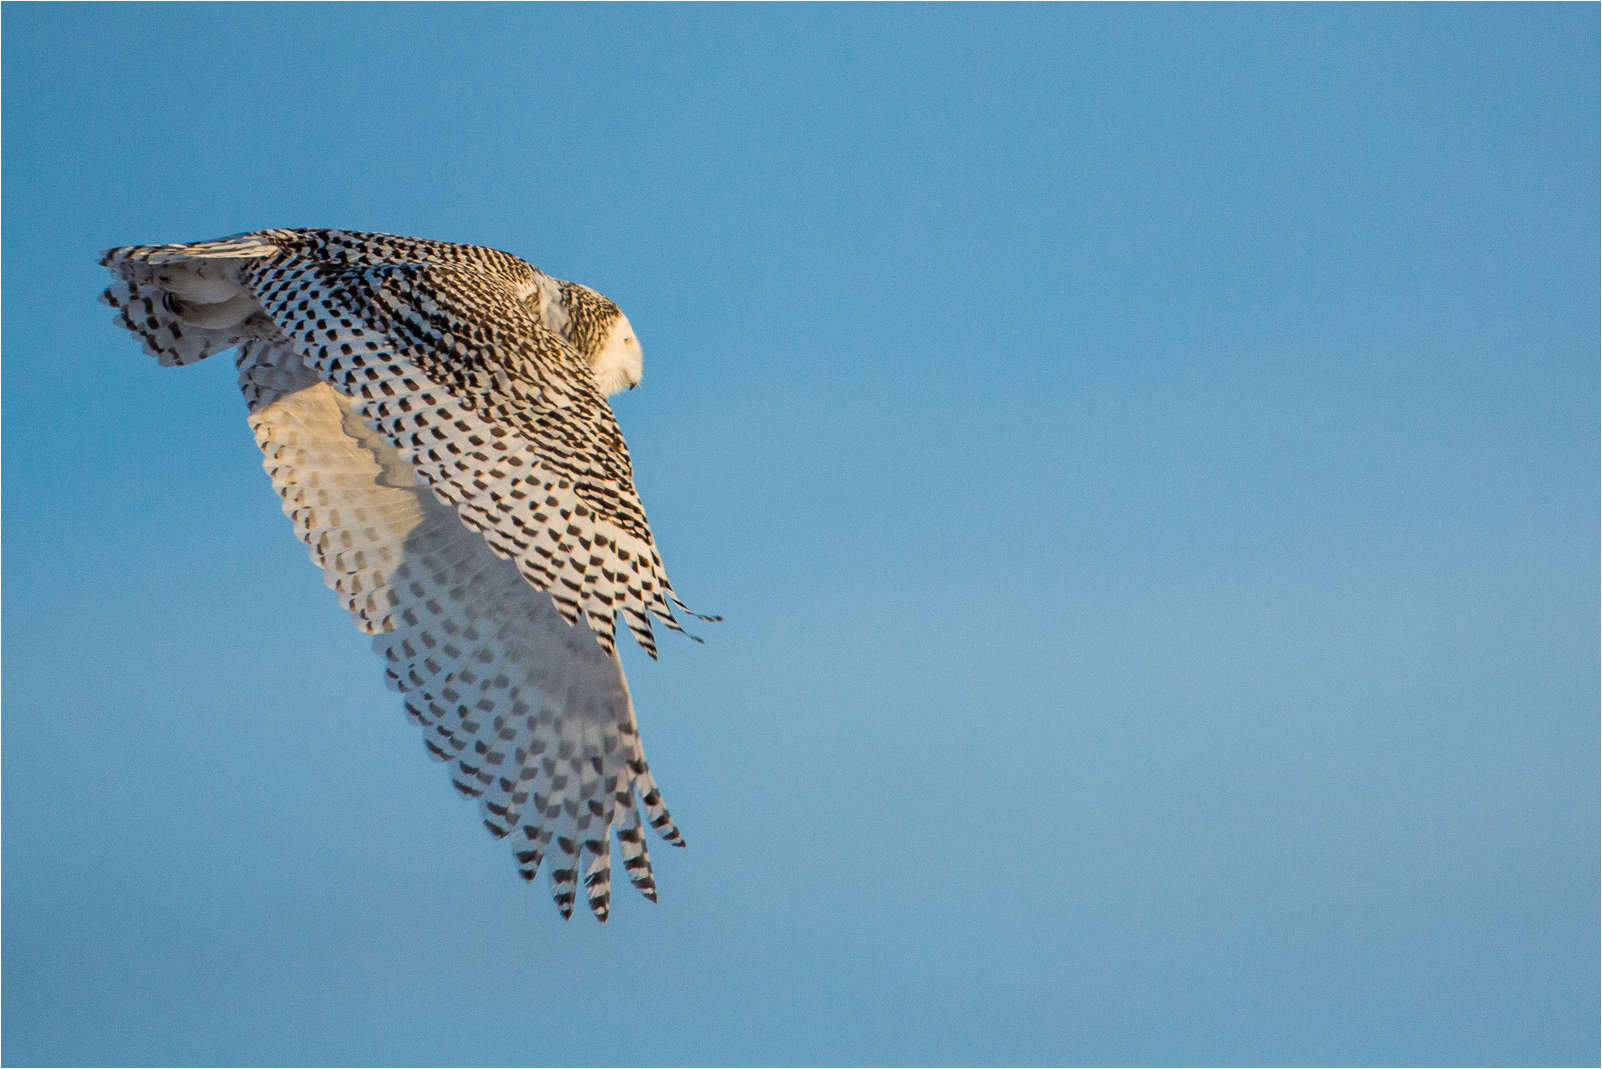 Flying away - © Christopher Martin-0178-2